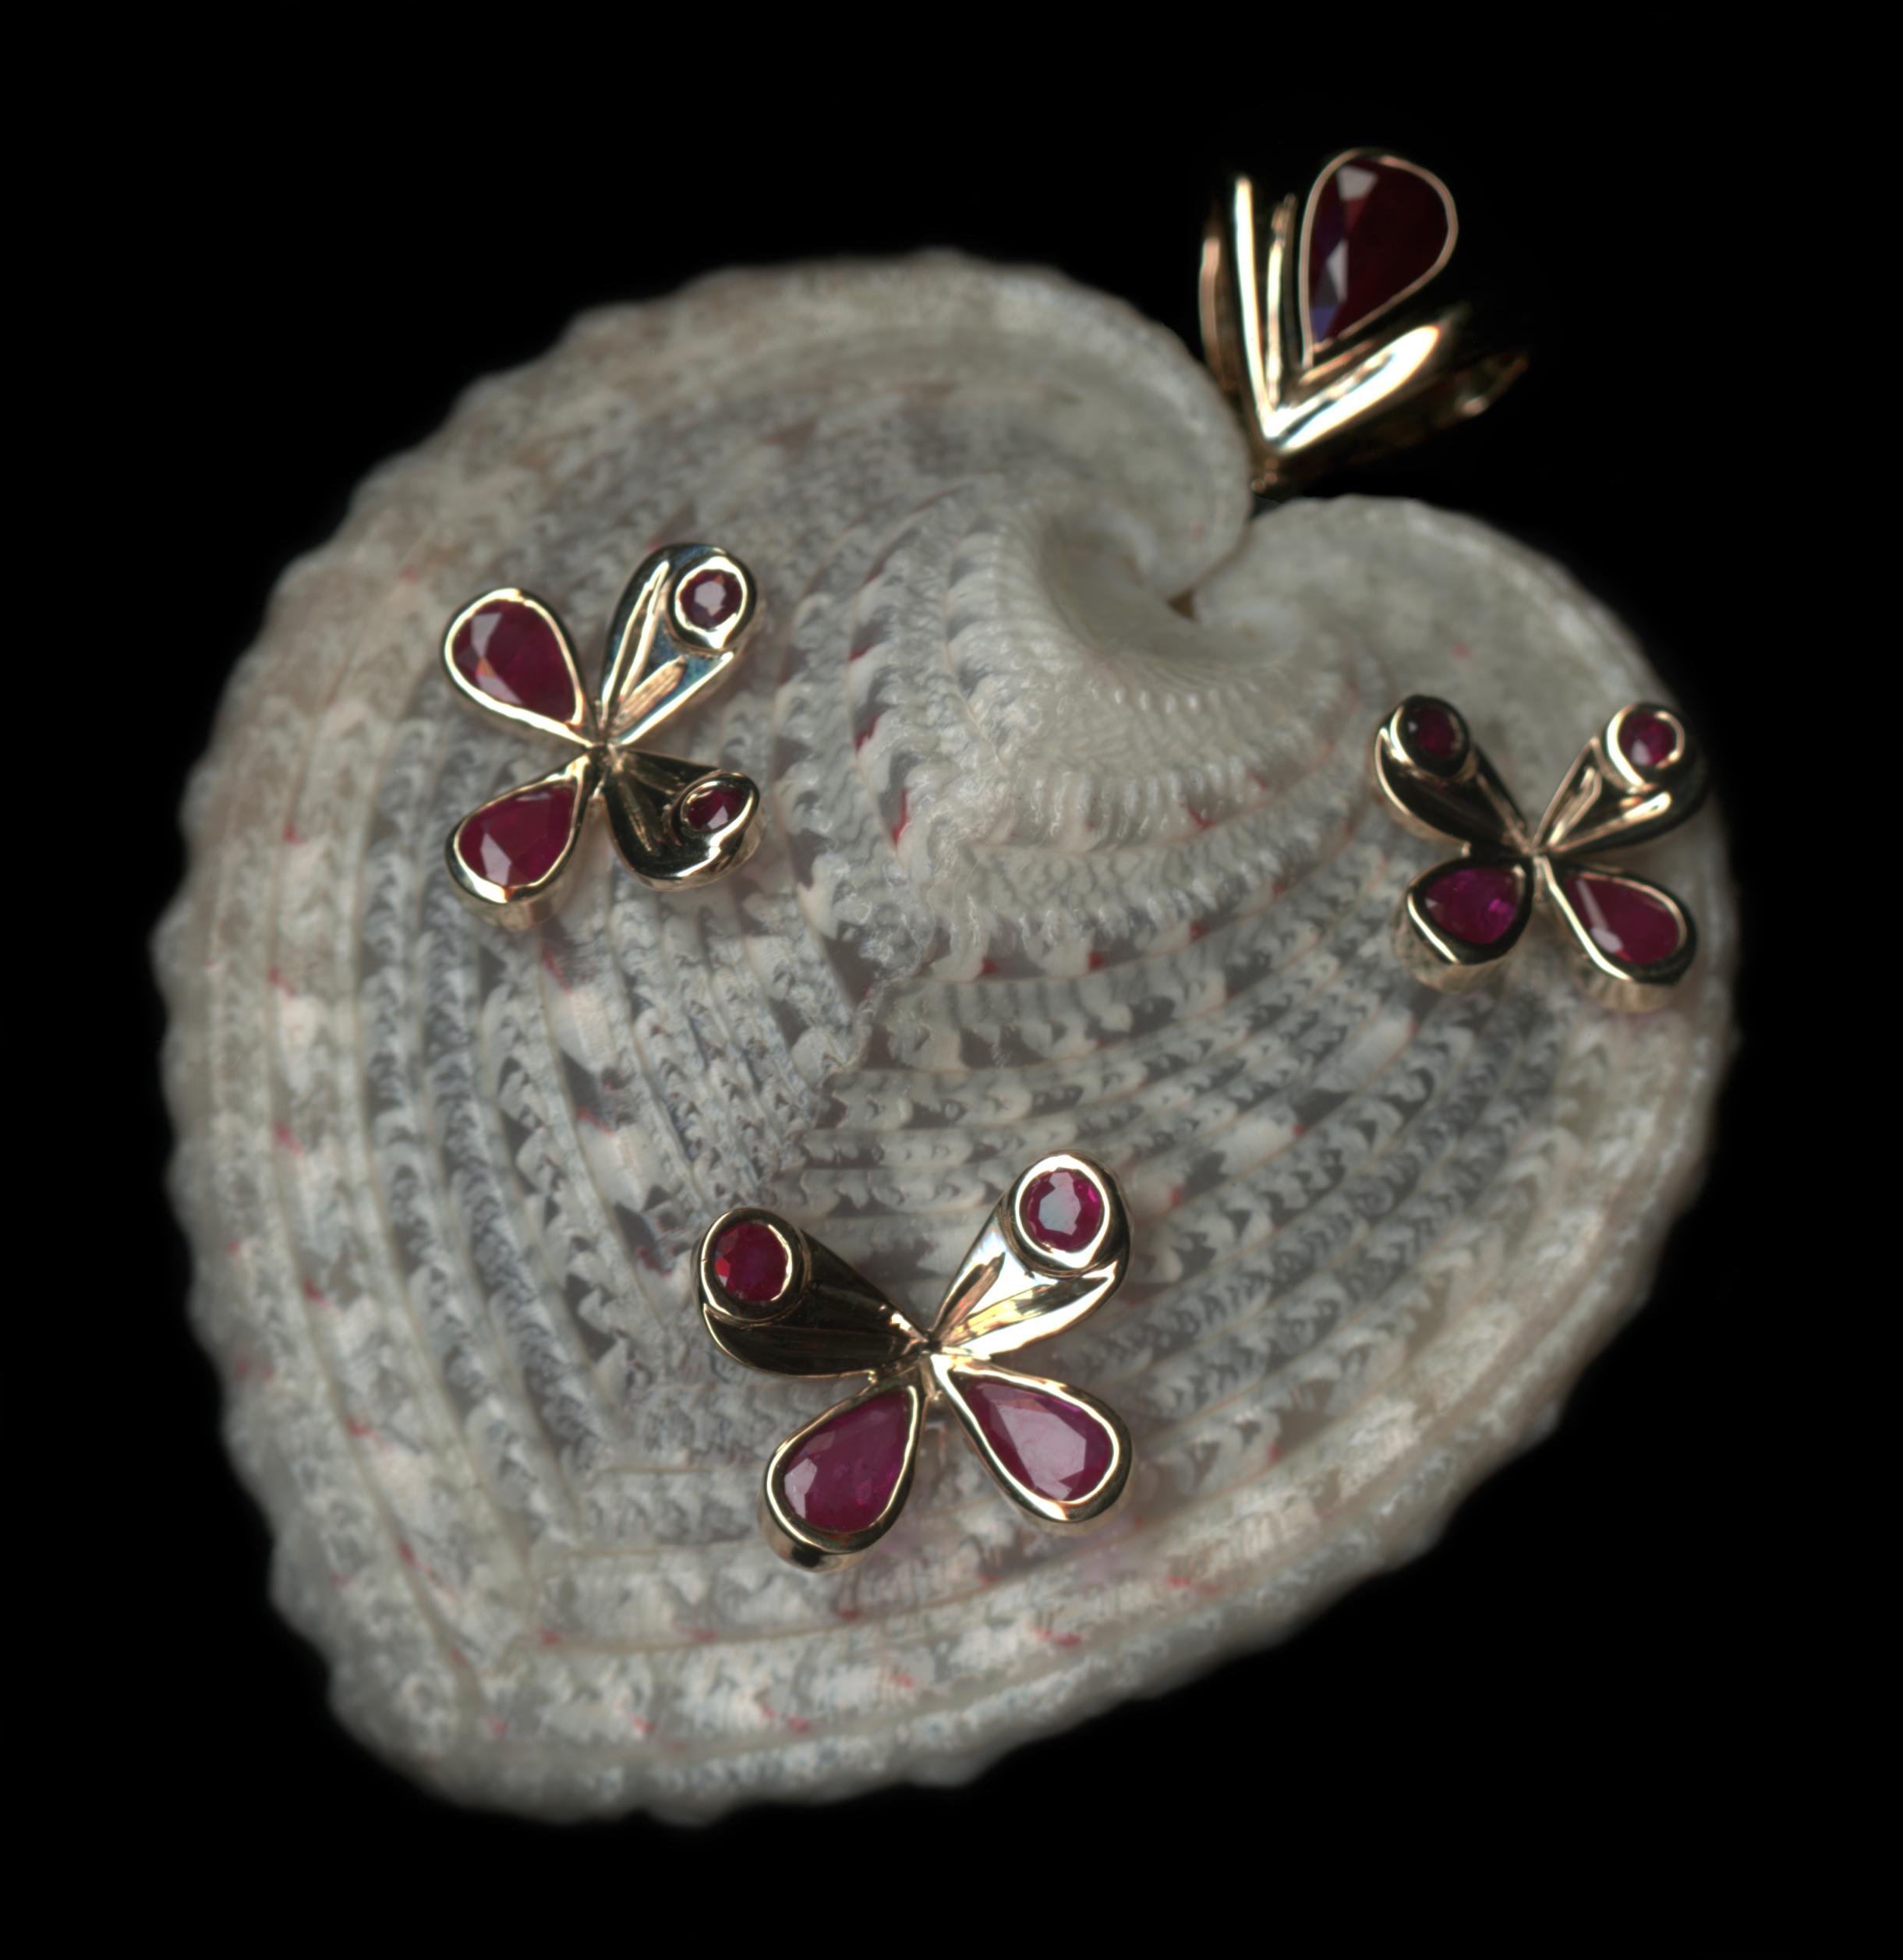 papillon - Cardissa -Luxury Jewelry\'s Cup - Golf Club Lys Chantilly